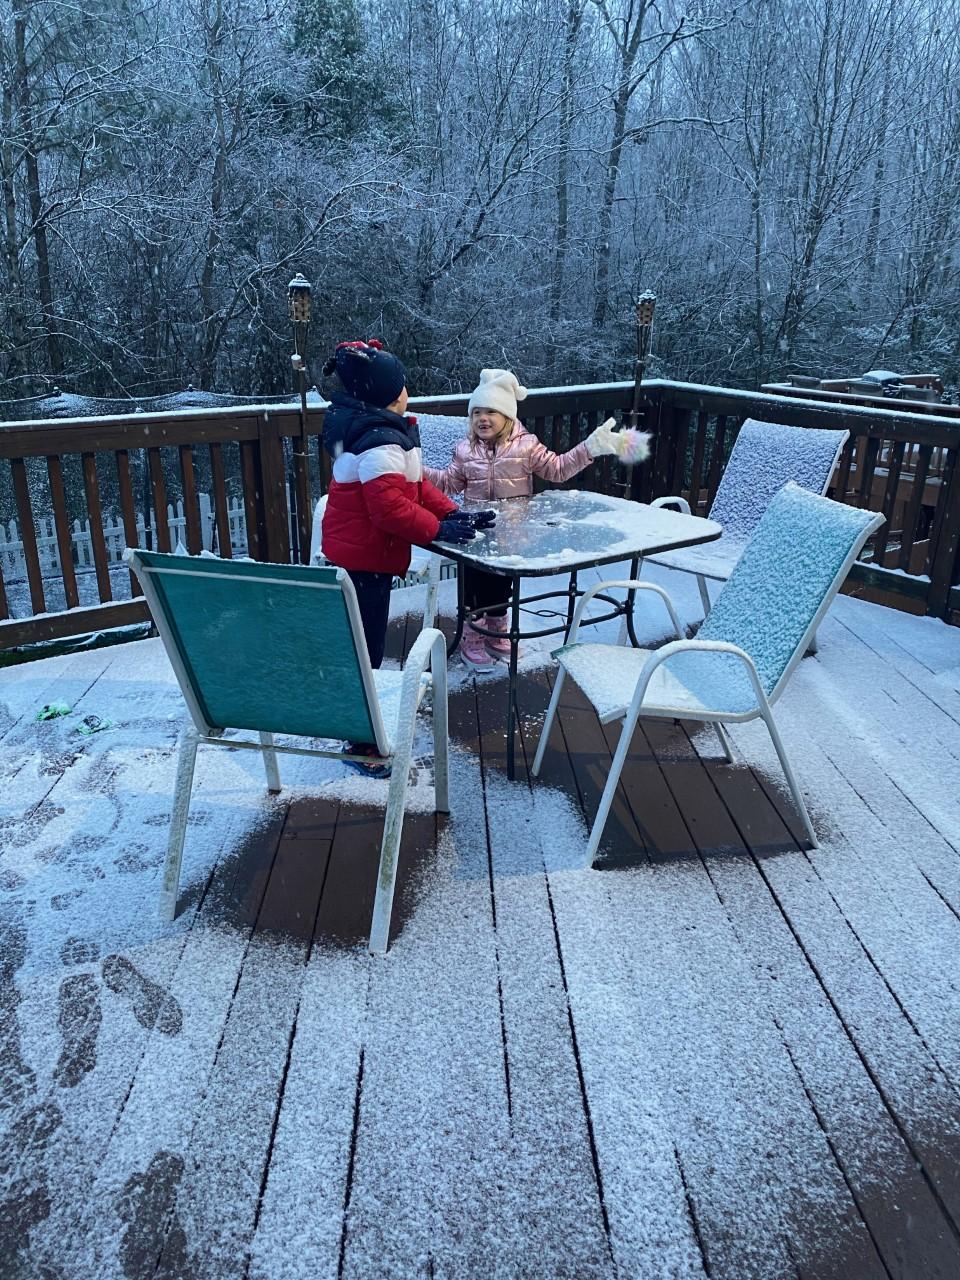 Children playing snow